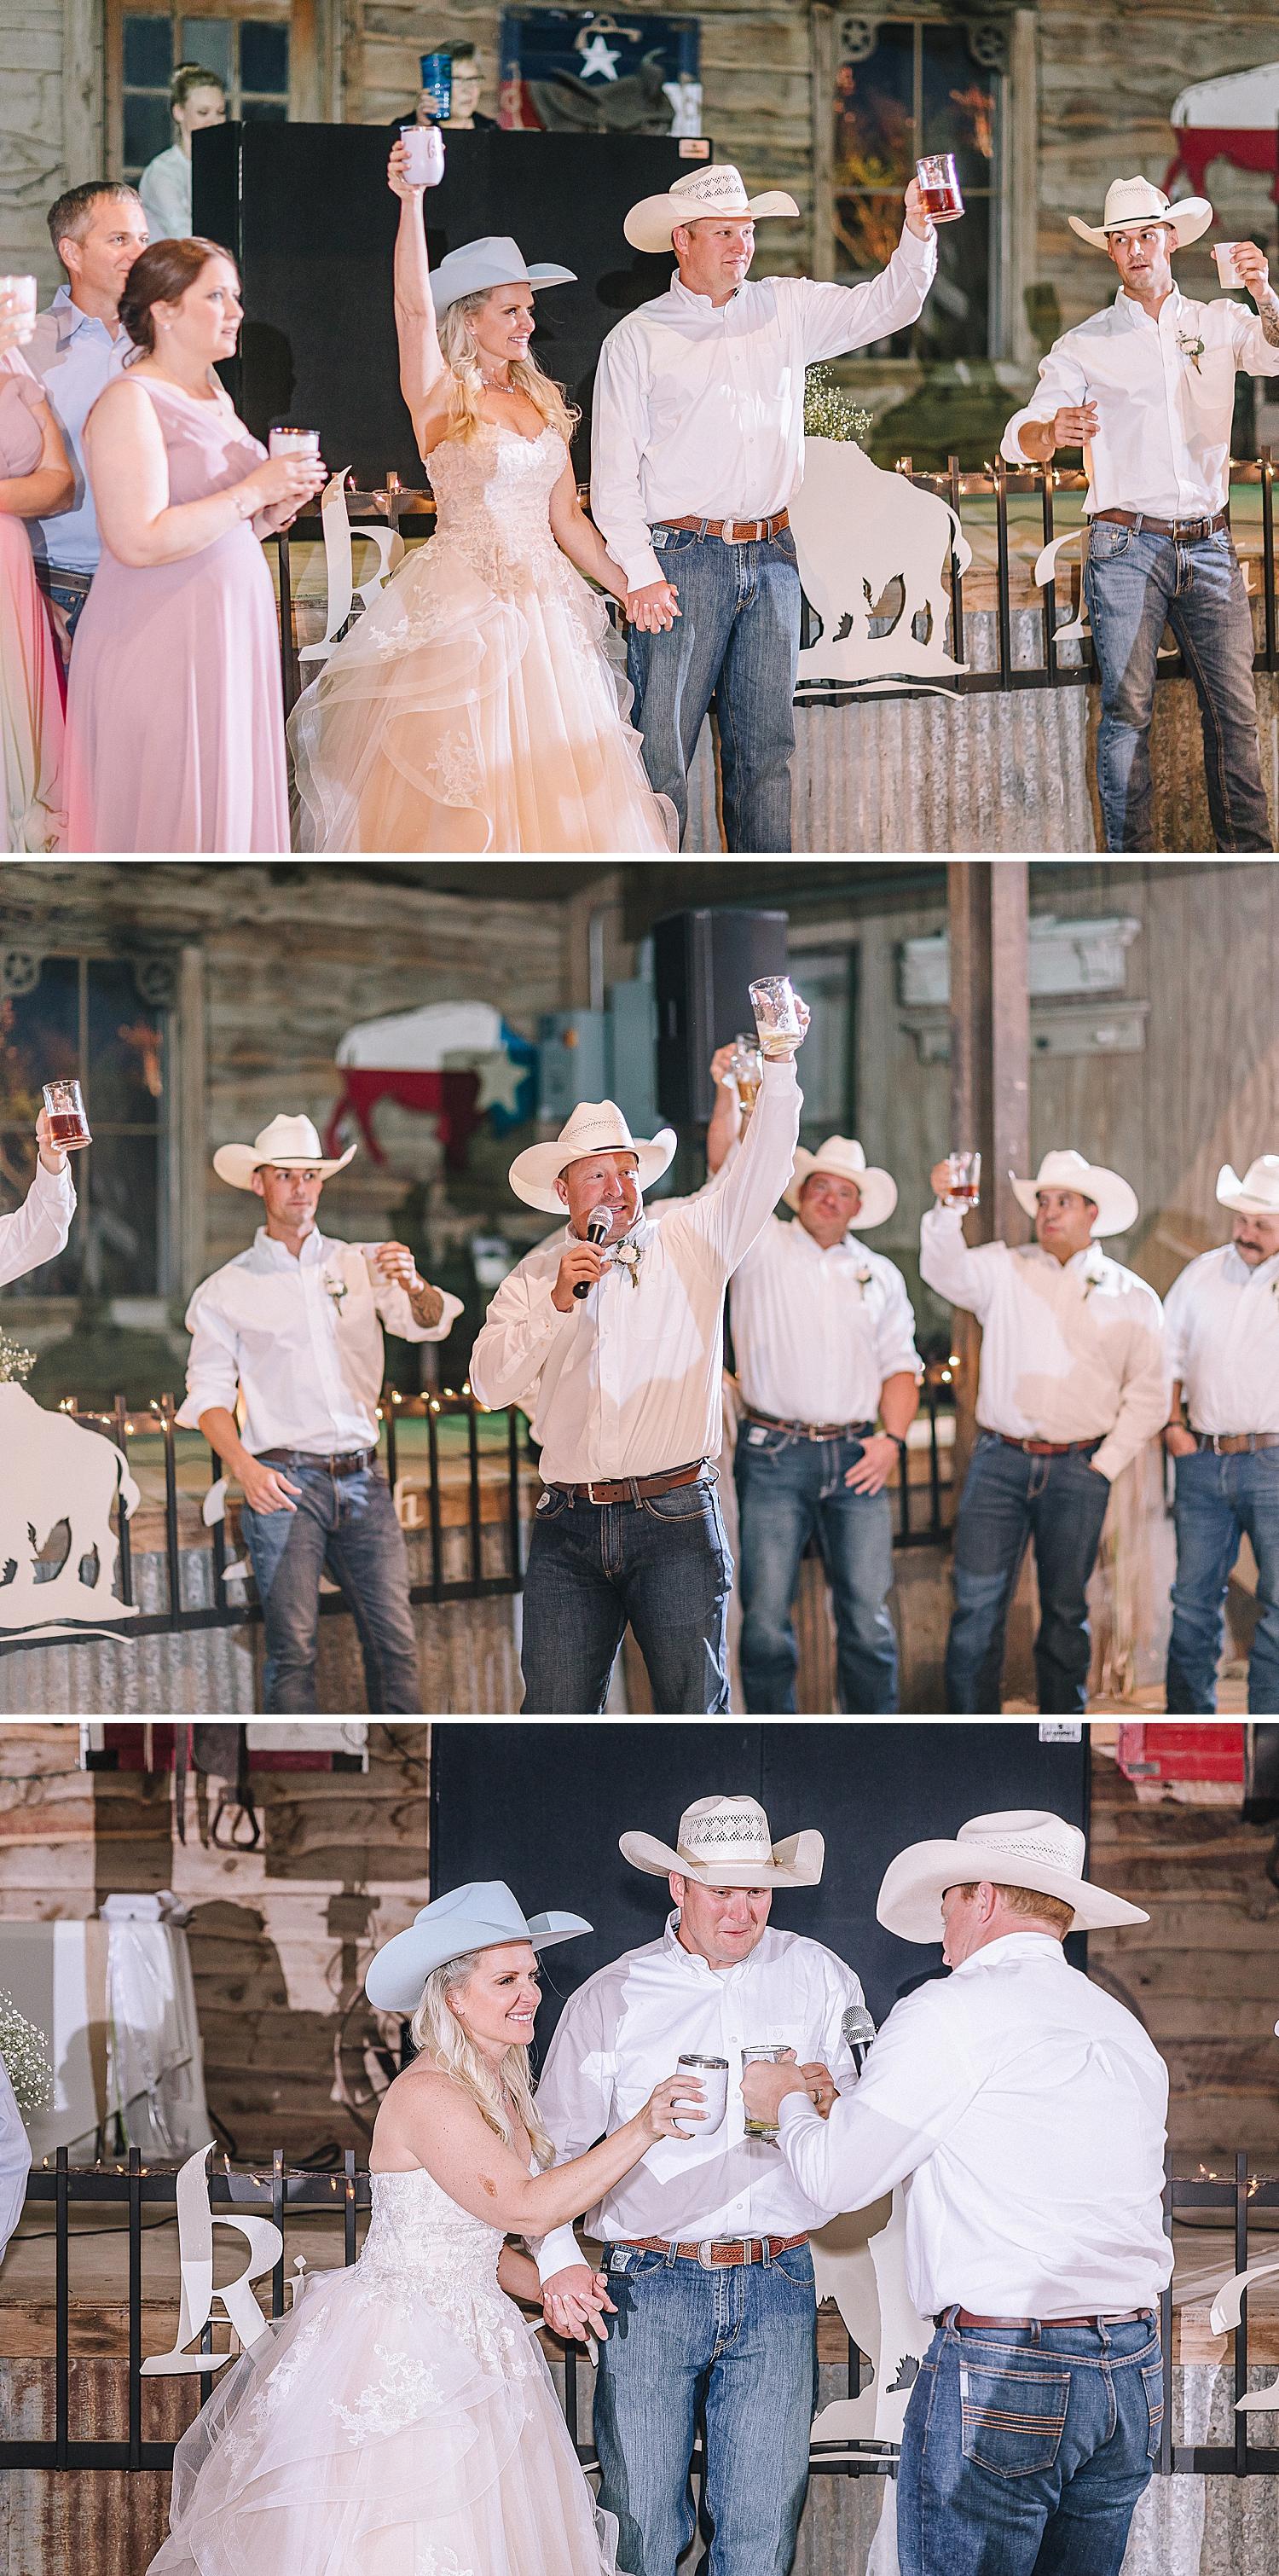 Rio-Cibilo-Ranch-Marion-Texas-Wedding-Rustic-Blush-Rose-Quartz-Details-Carly-Barton-Photography_0110.jpg